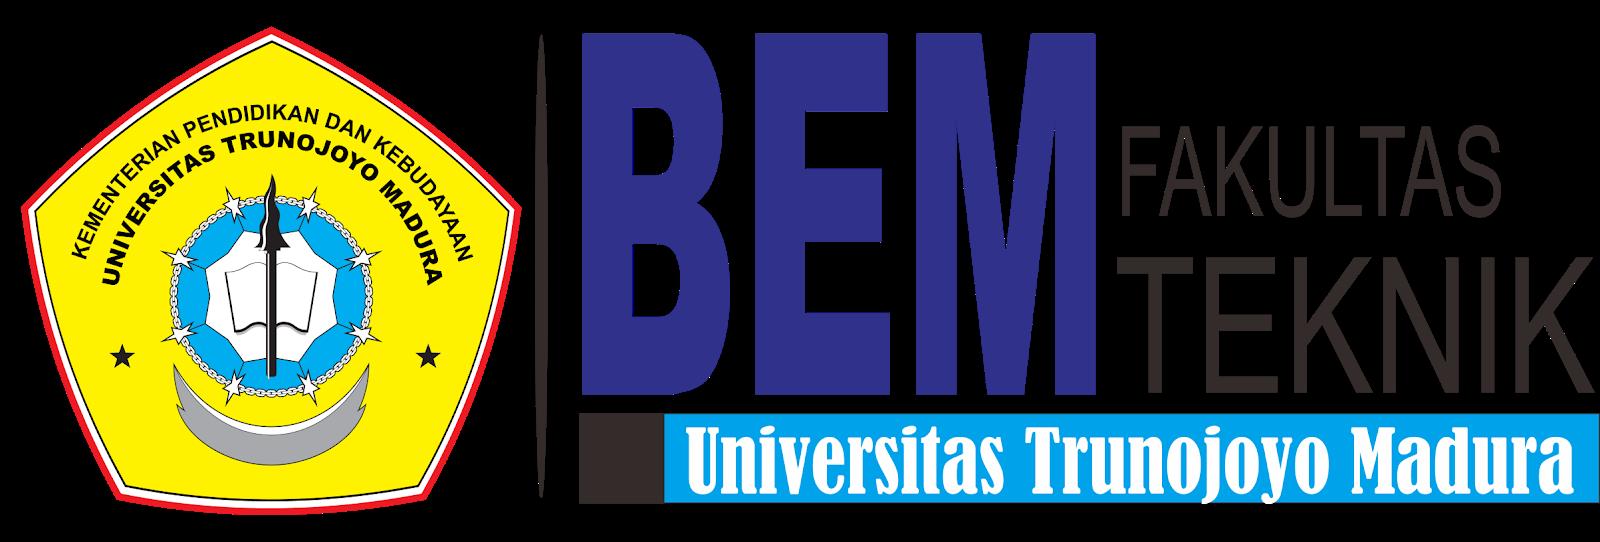 BEM-FT 2021